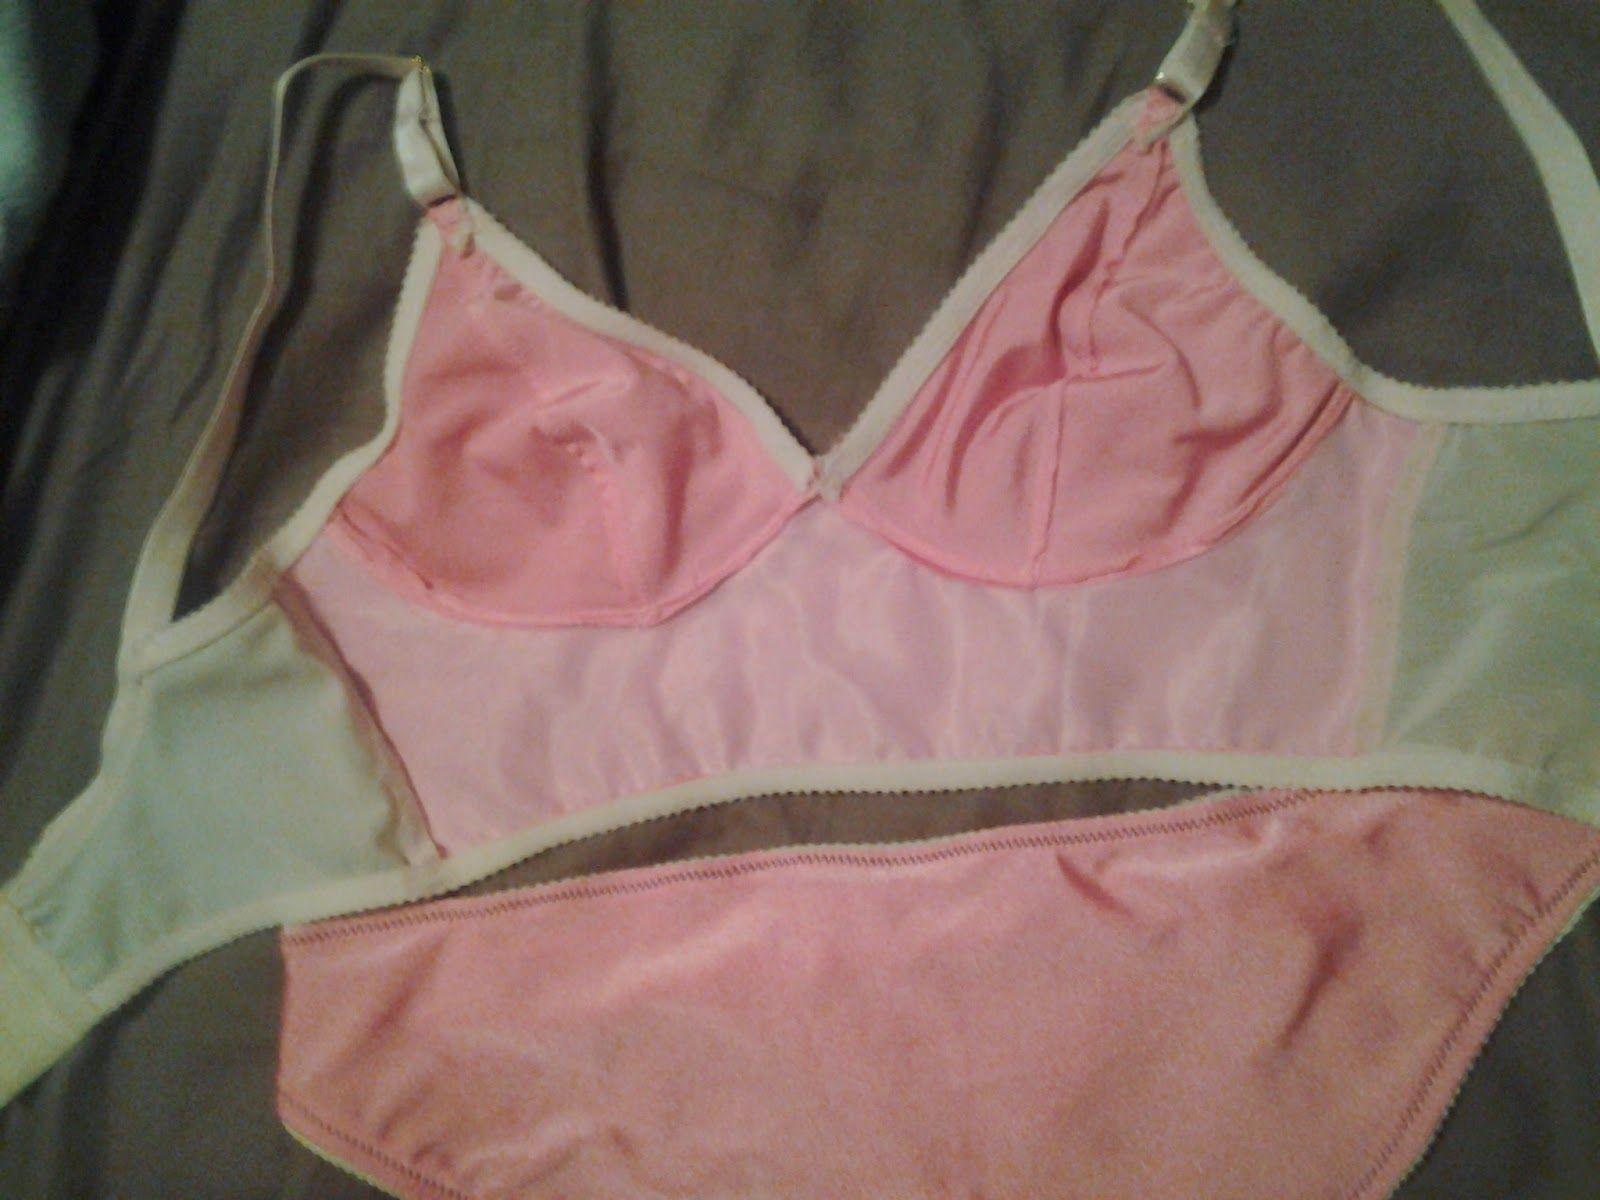 9c23f458720 Guild of Goods  Lingerie  Cloth Habit s Watson Bra   Bikini and Rosy  Ladyshorts Patterns